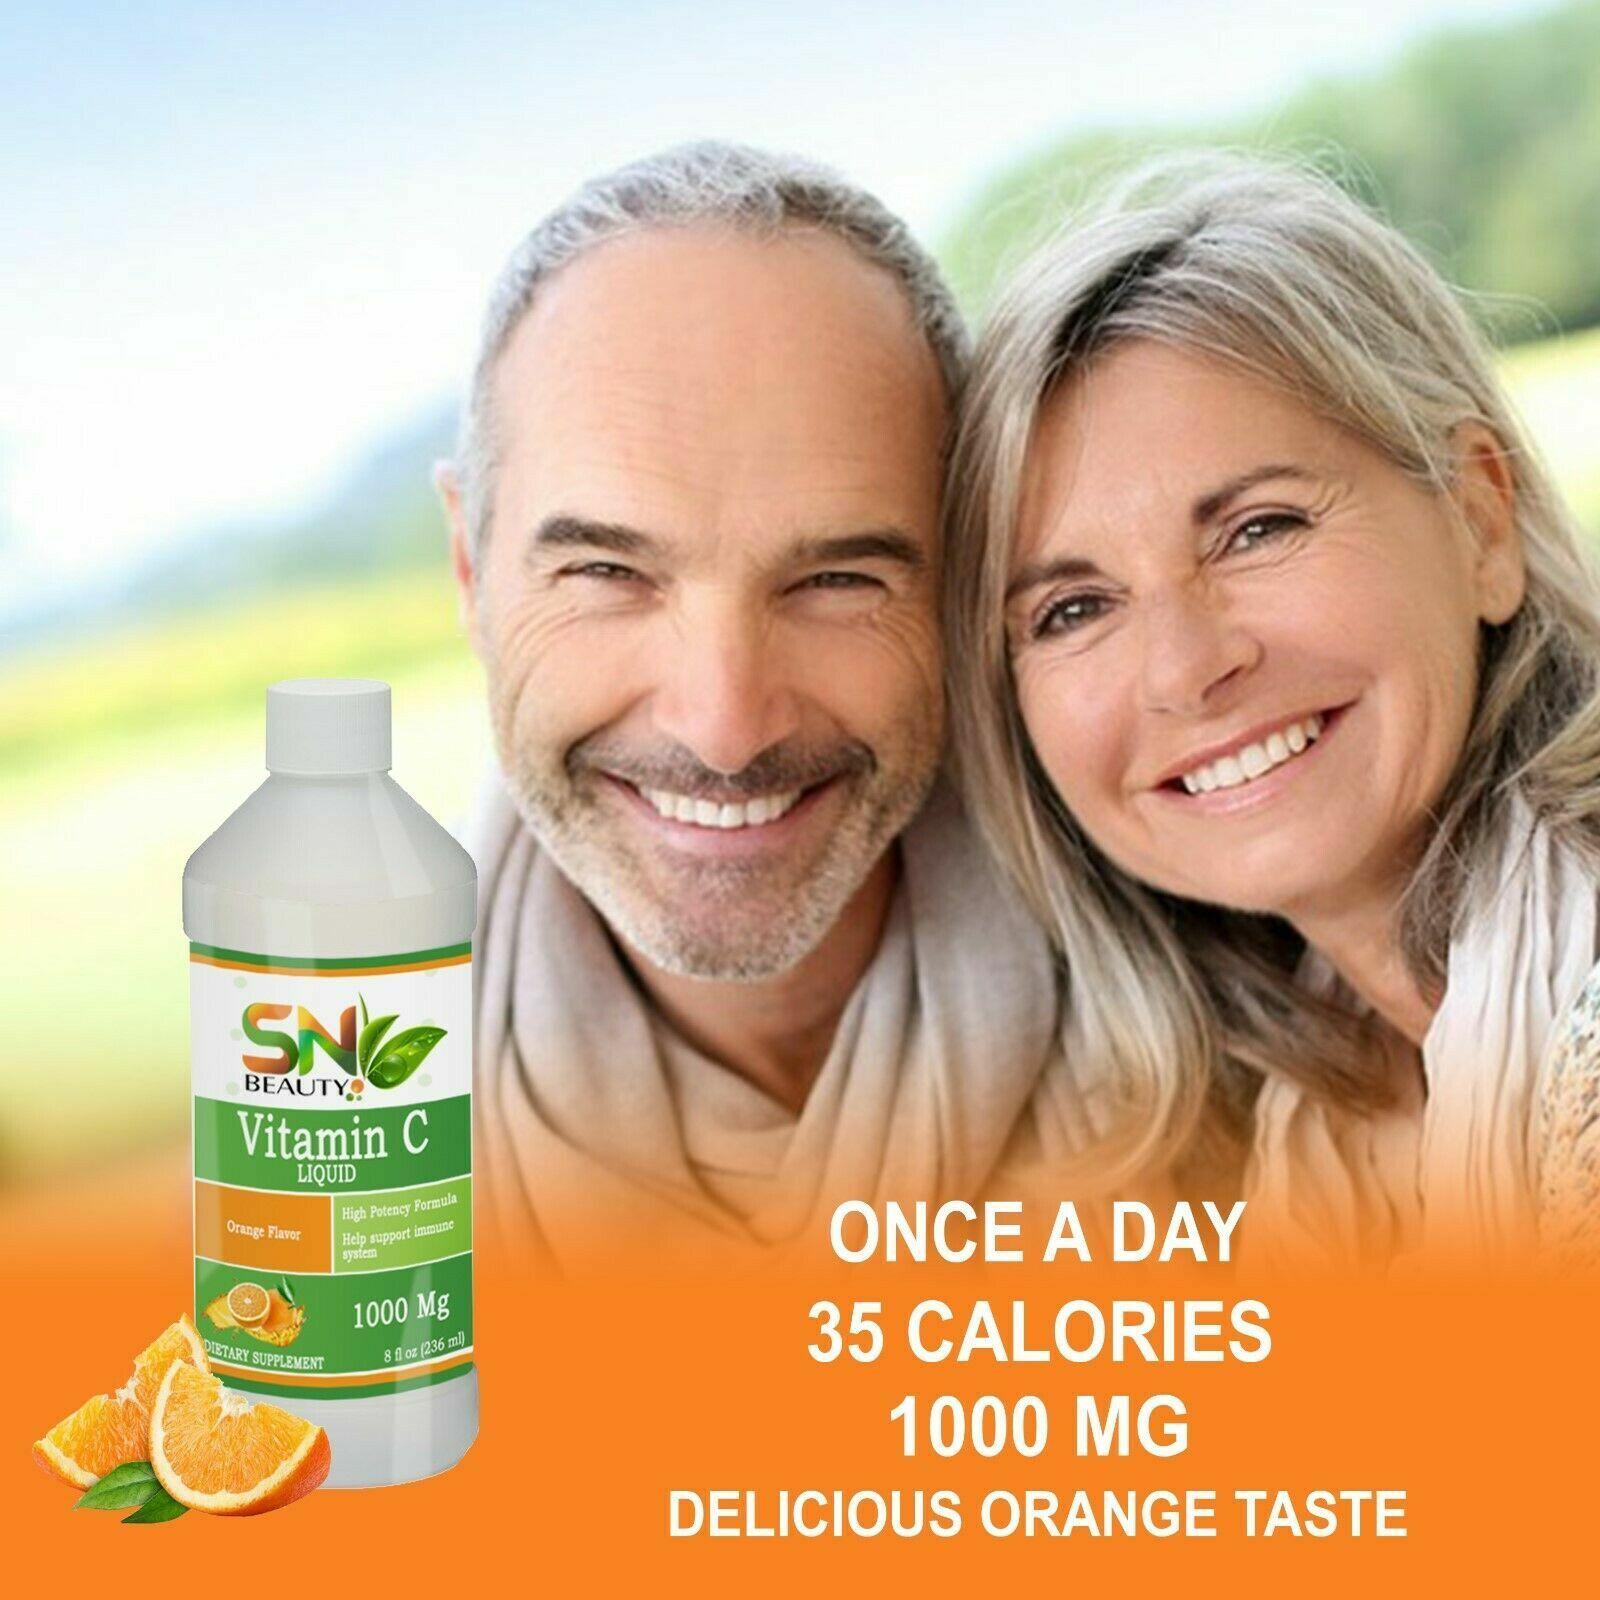 Pure Vitamin C 1000 mg support immune System very high quality liquid vitamina C 1